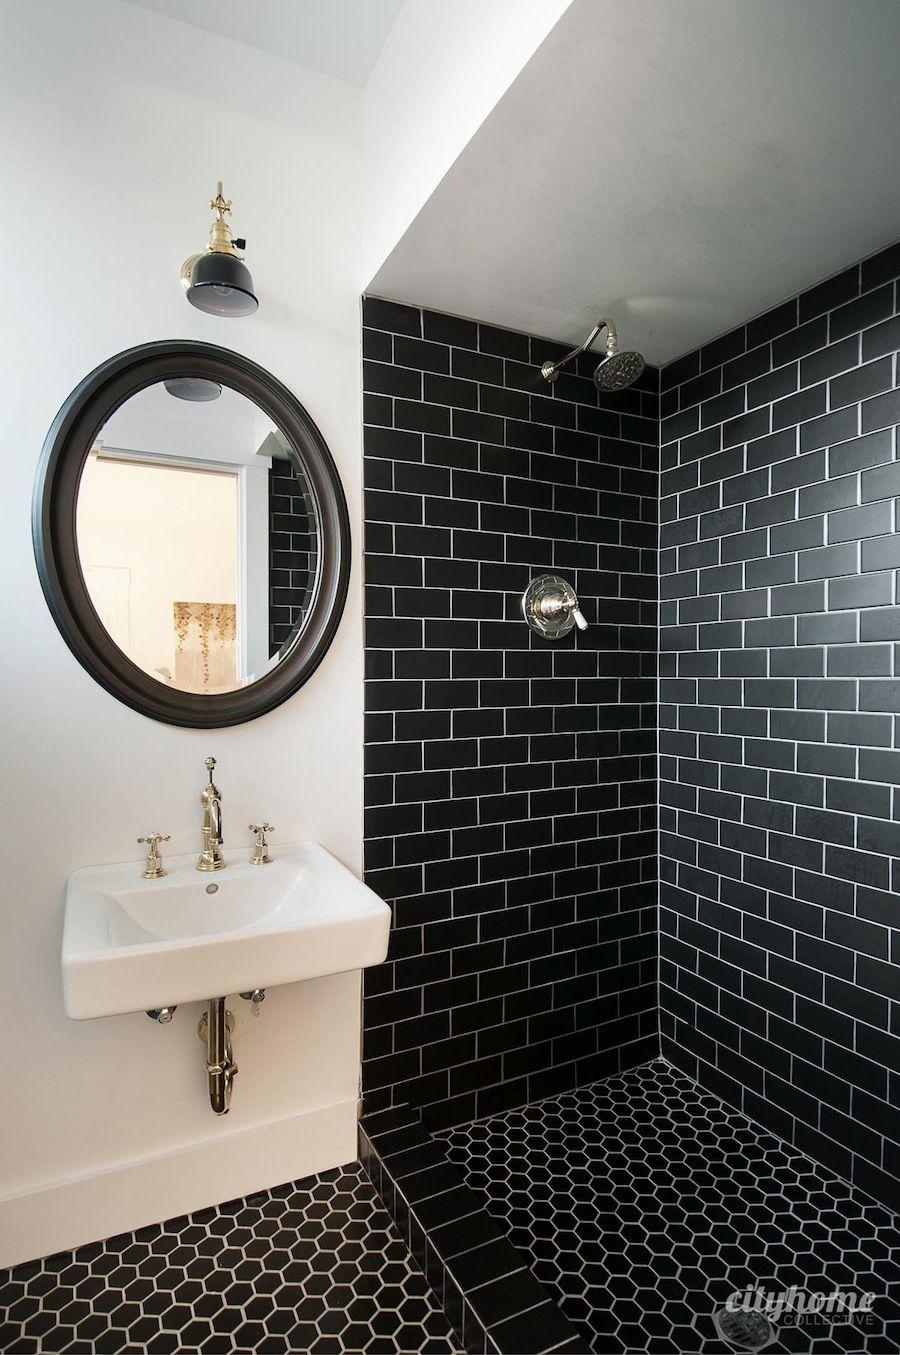 1960 badezimmer dekor ramble on  houseideas  pinterest  lavabo sala de banho and casas